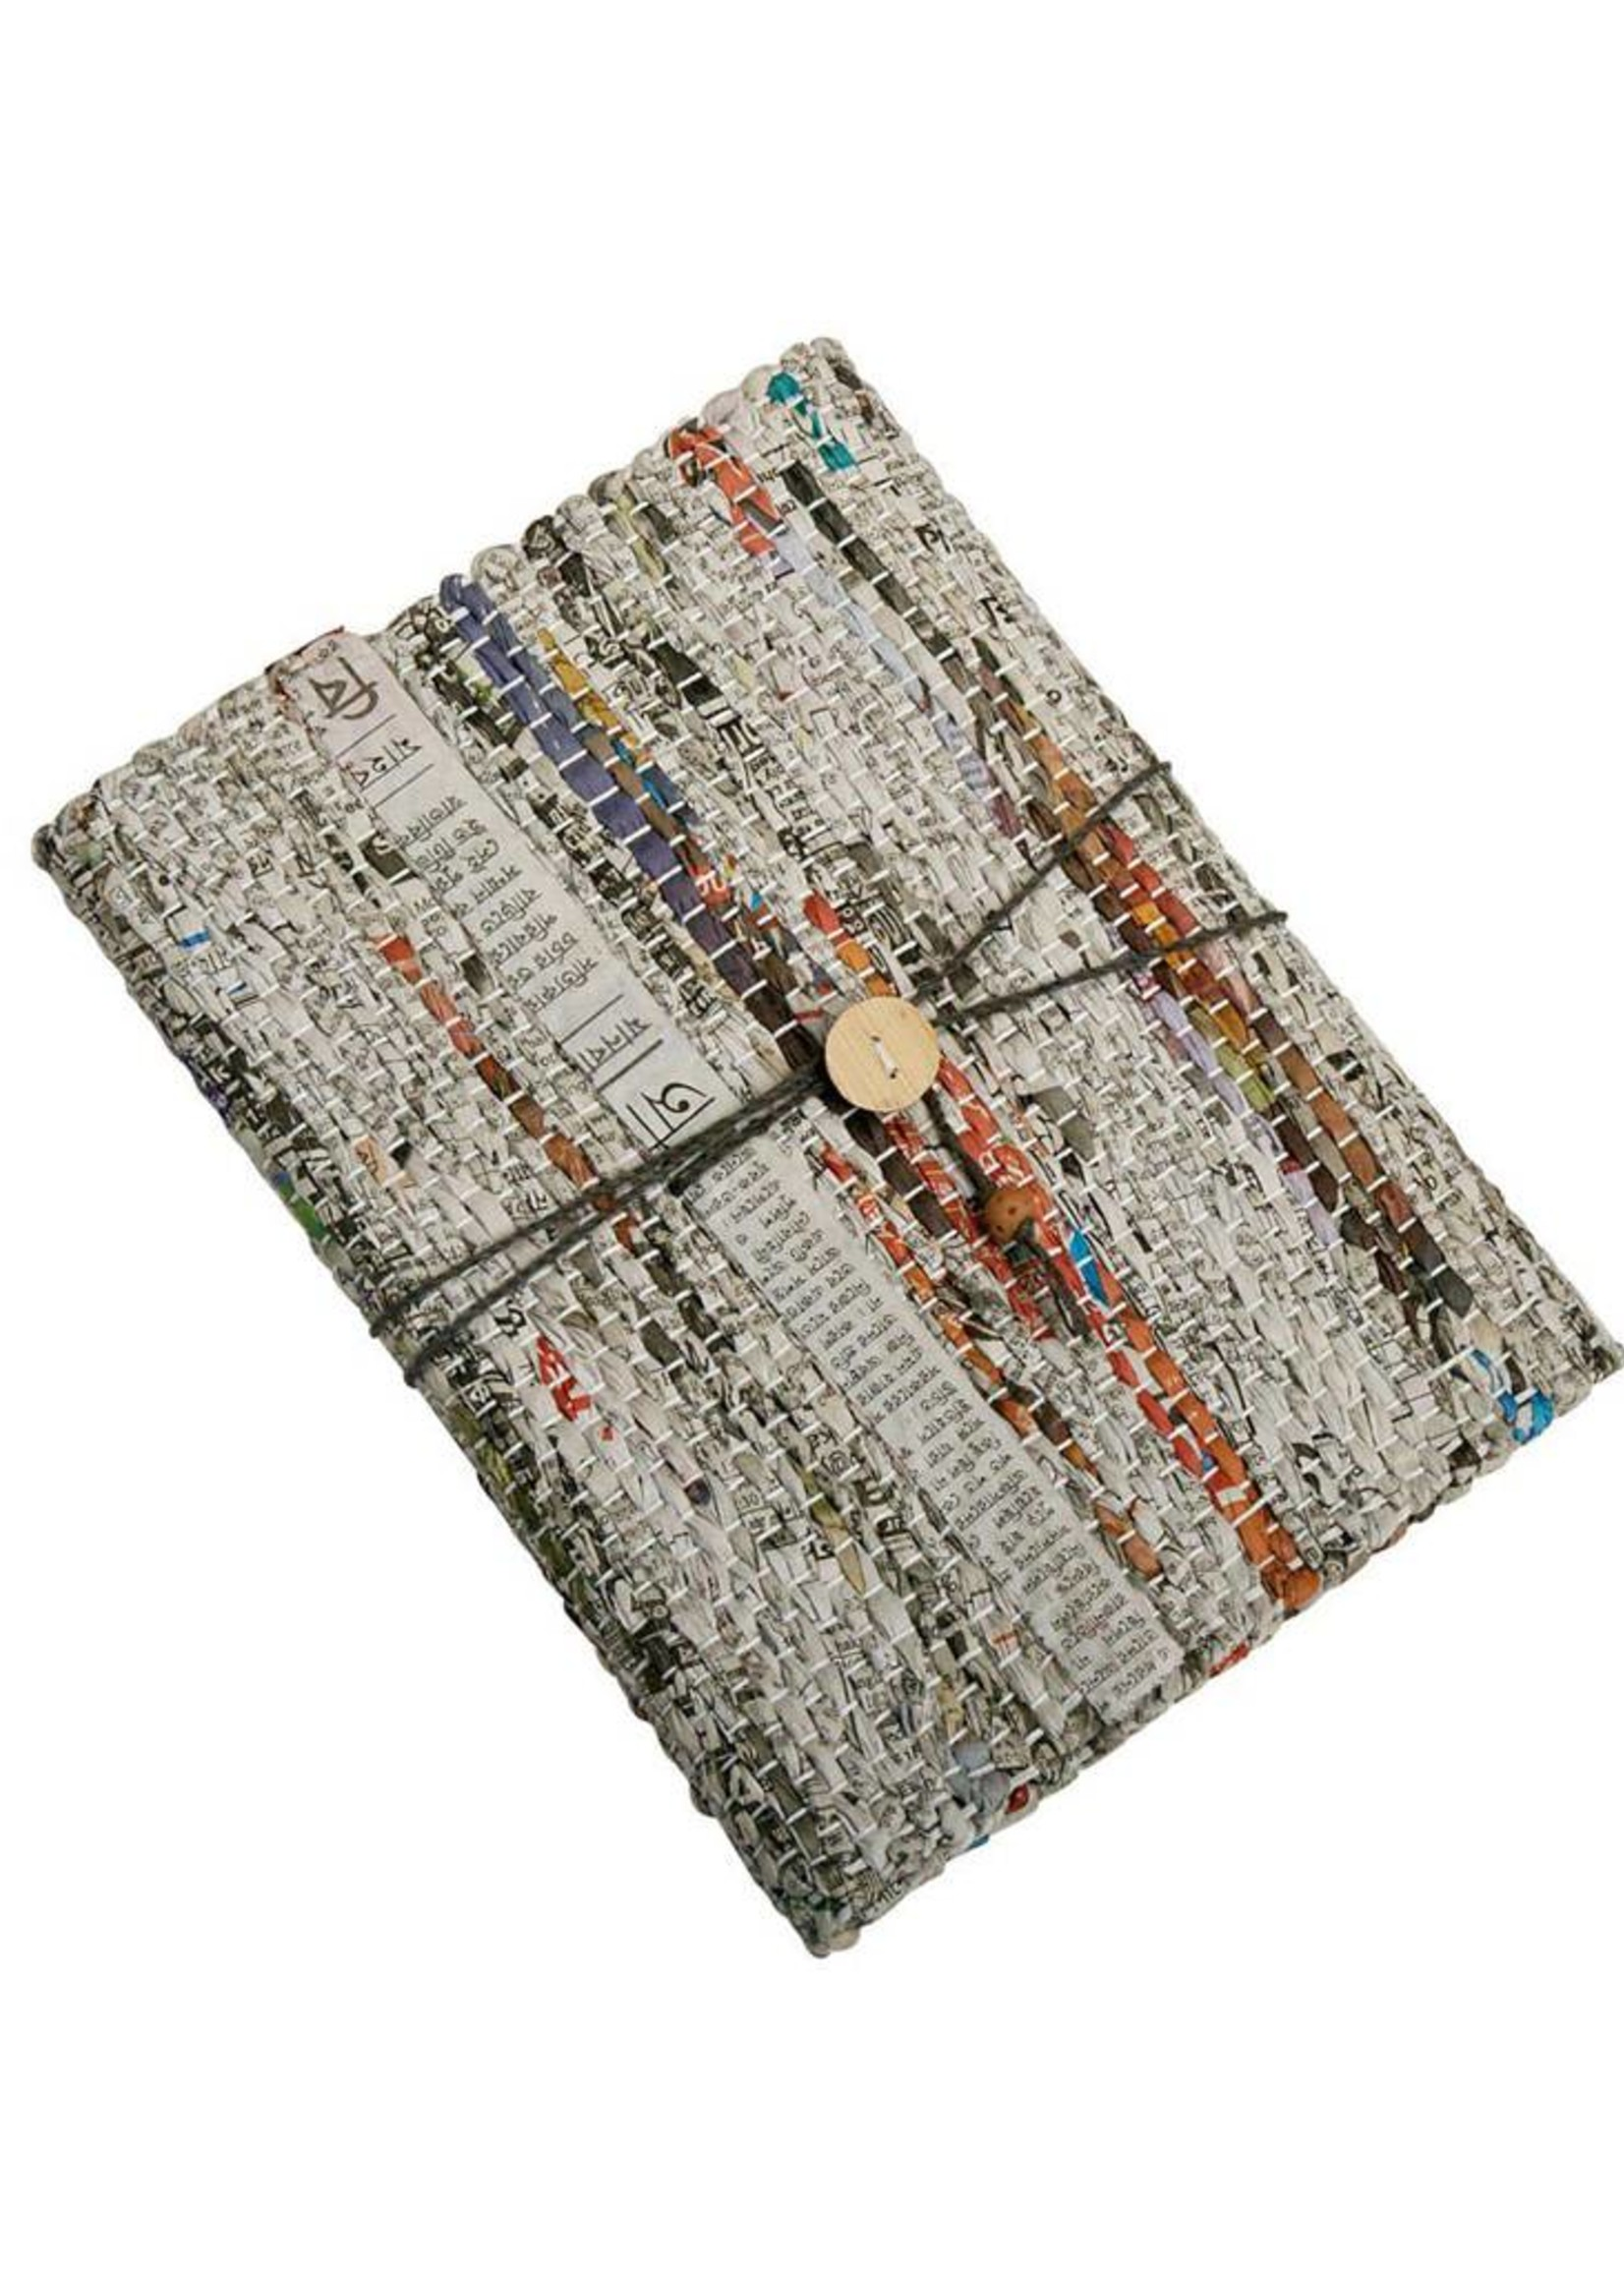 Prokritee Recycled Newspaper Journal